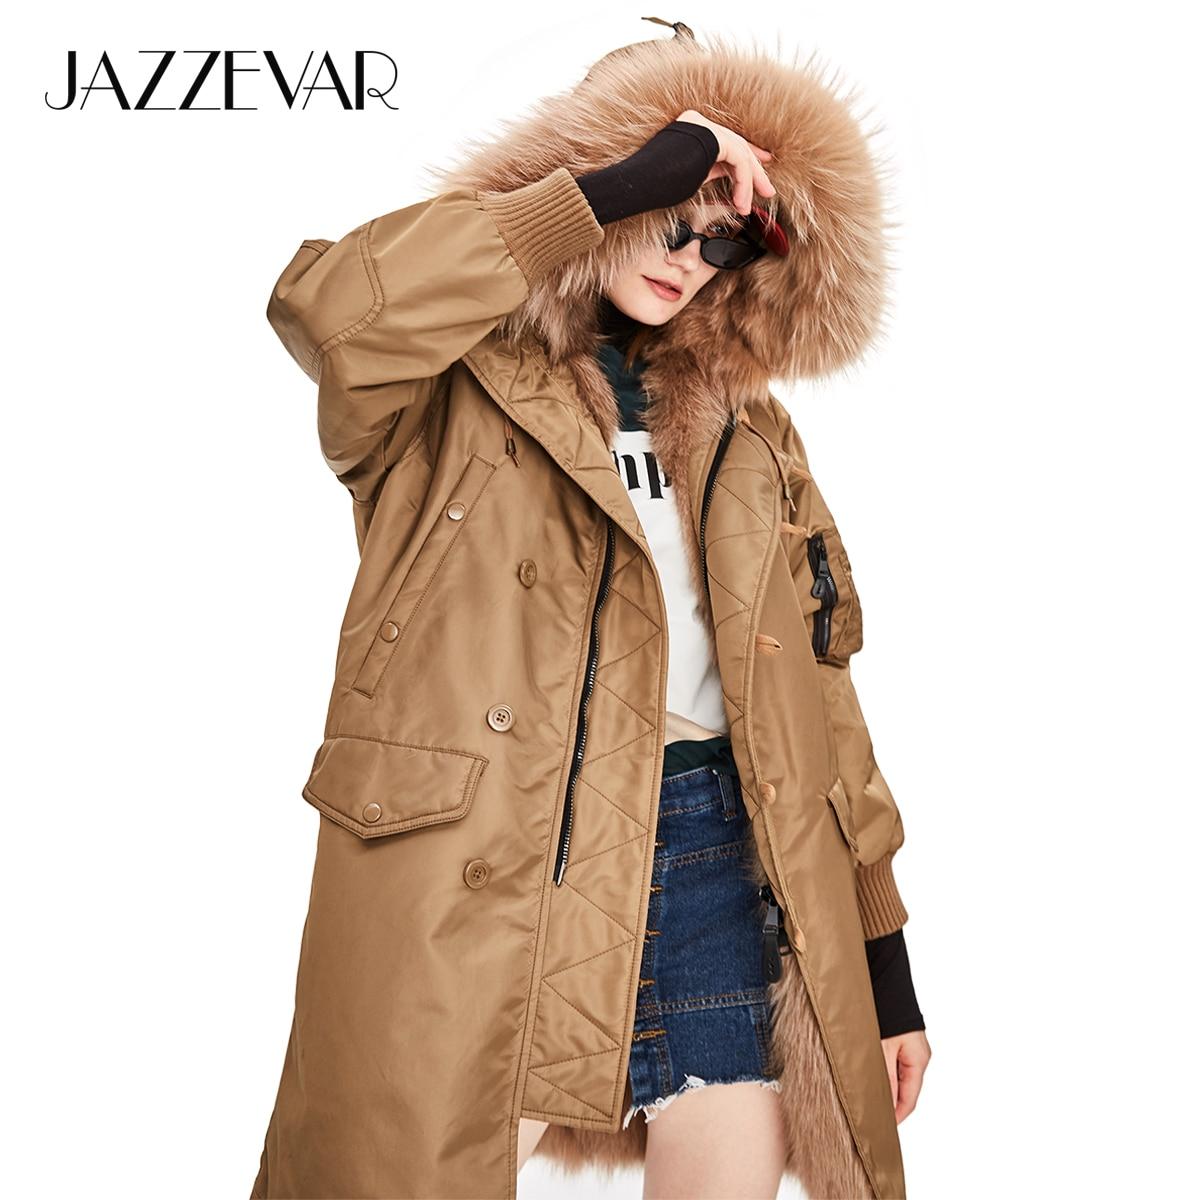 JAZZEVAR 2018 New Winter High Fashion Safari Style Women Luxurious Fur Military Parka Thick Fox lining Ladies Hooded Coat|Real Fur|   - AliExpress